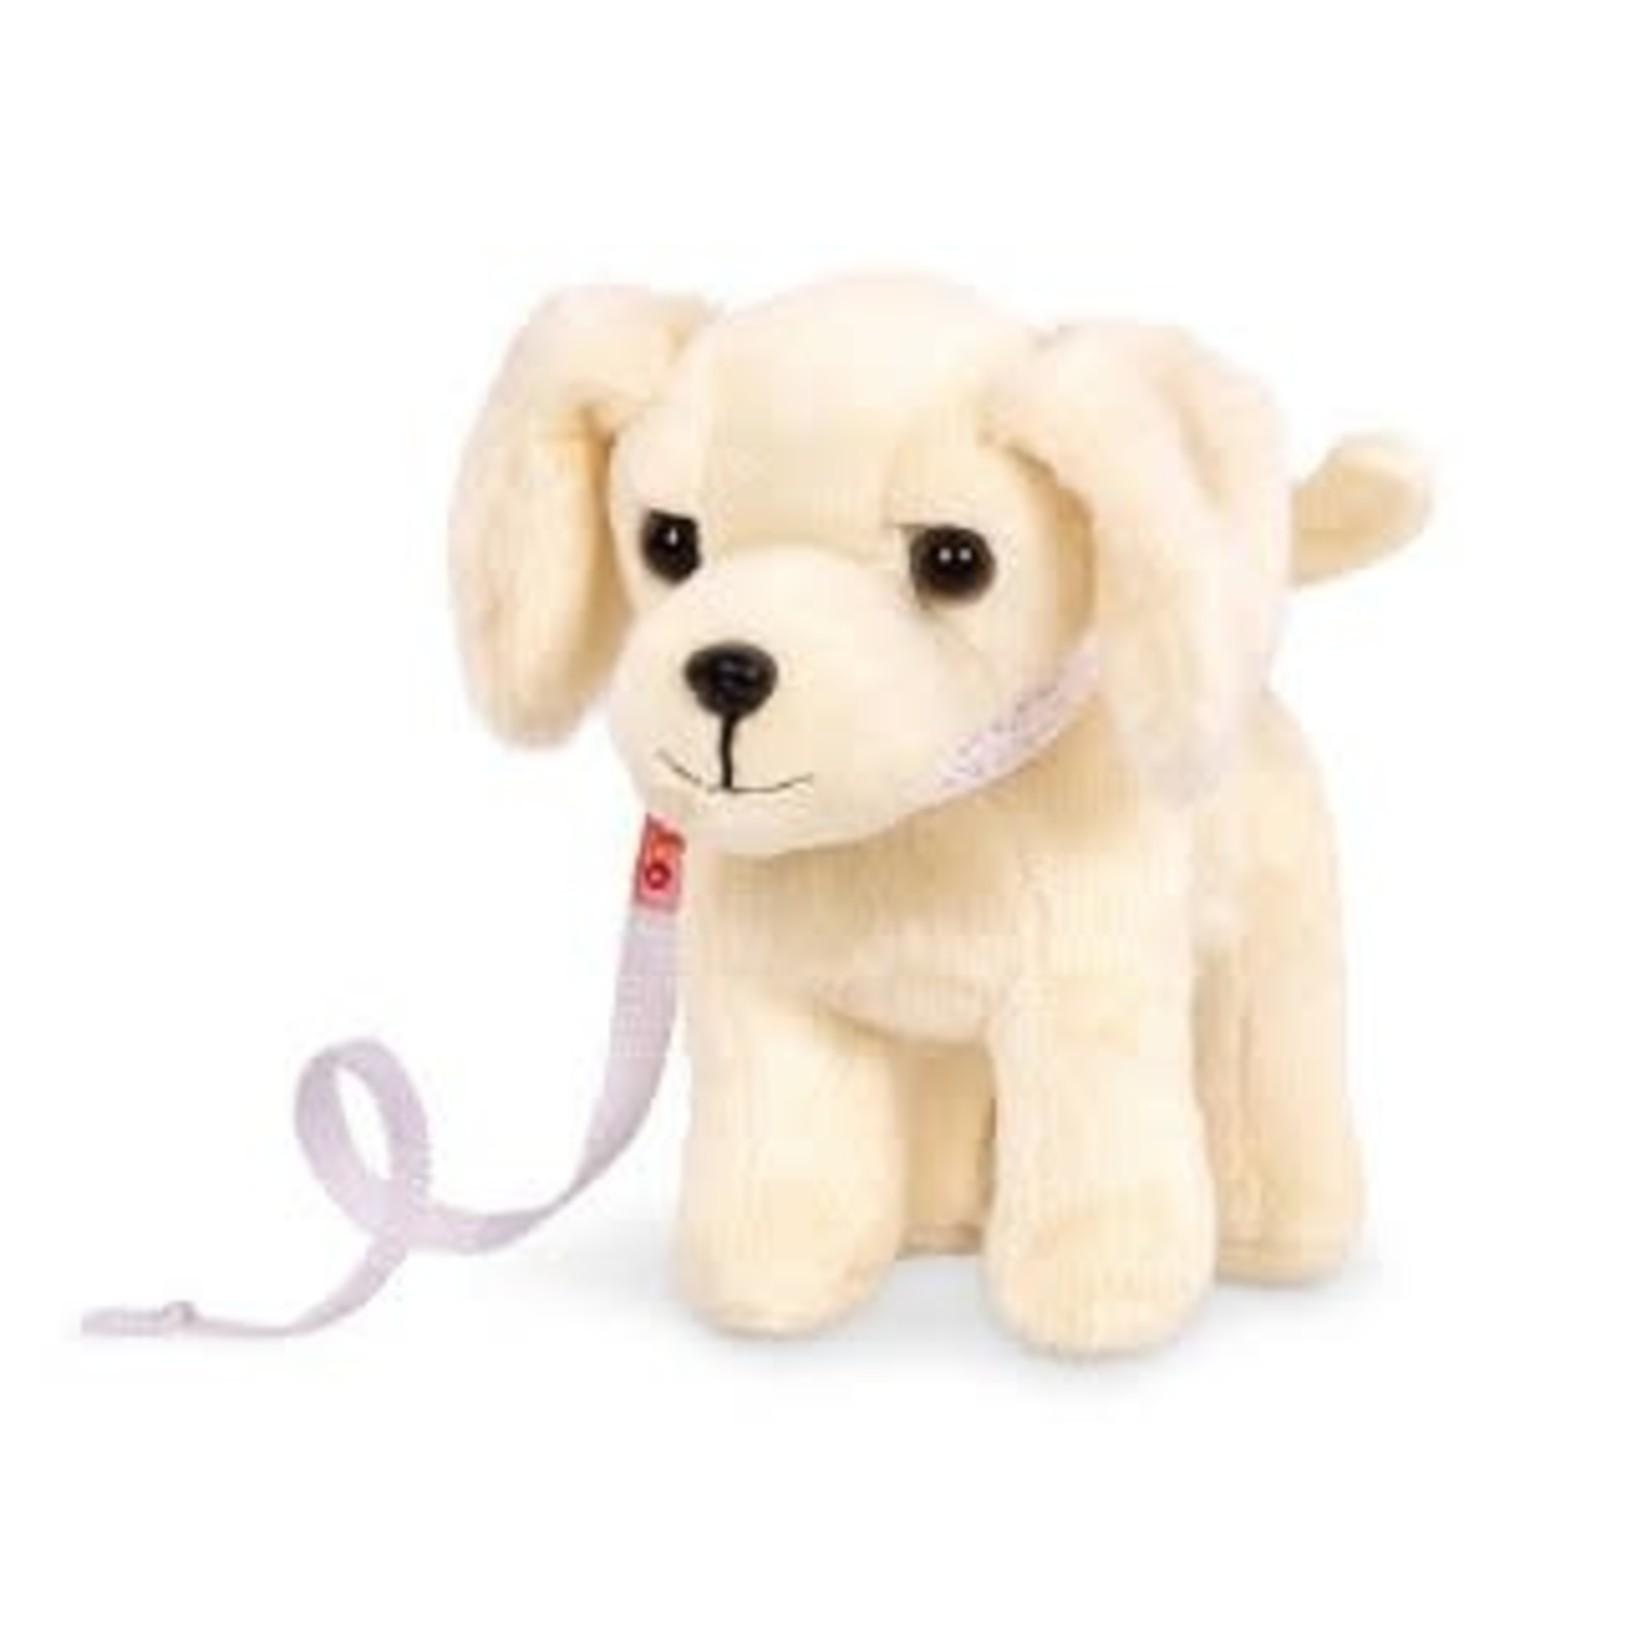 Our Generation Pet Dog Plush with Posable Legs - Golden Retriever Pup